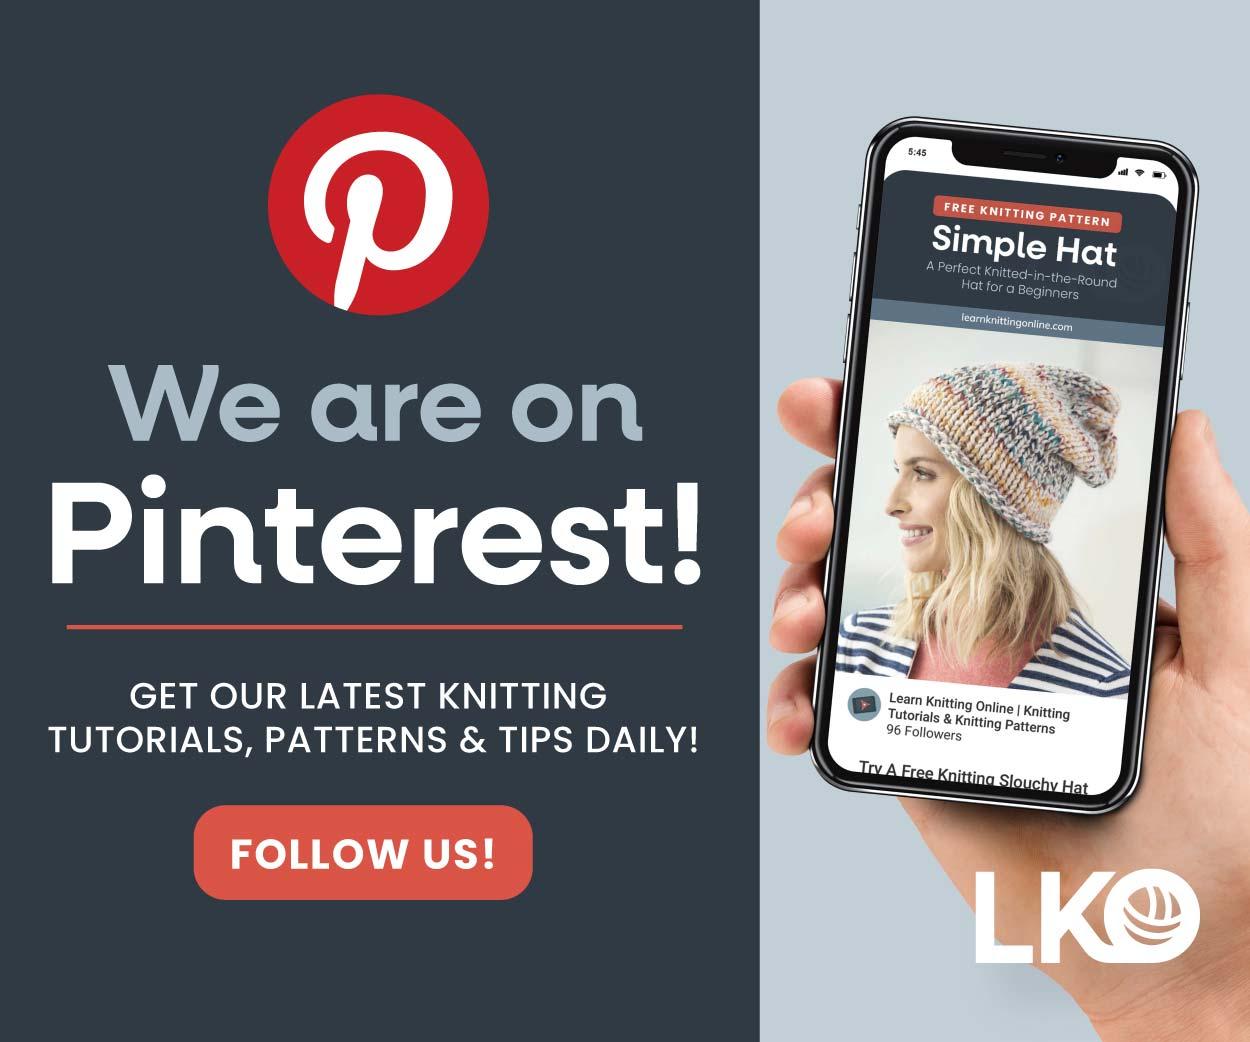 Find Us on Pinterest | Learn Knitting Online